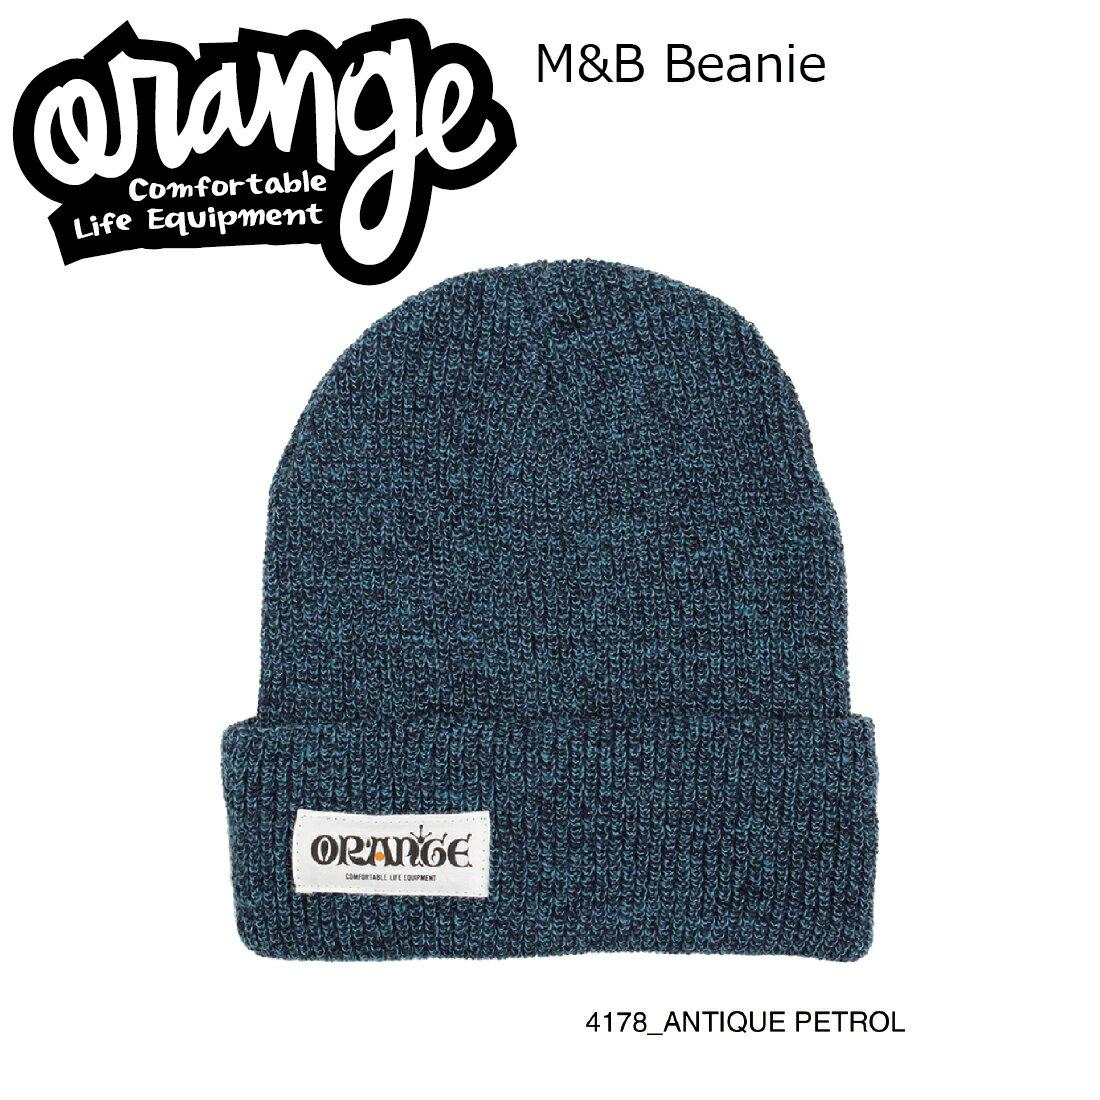 Oran'ge M&B Beanie 4178 ANTIQUE PETROL オレンジ エムアンドビー ビーニー ニットキャップ 2つ折り